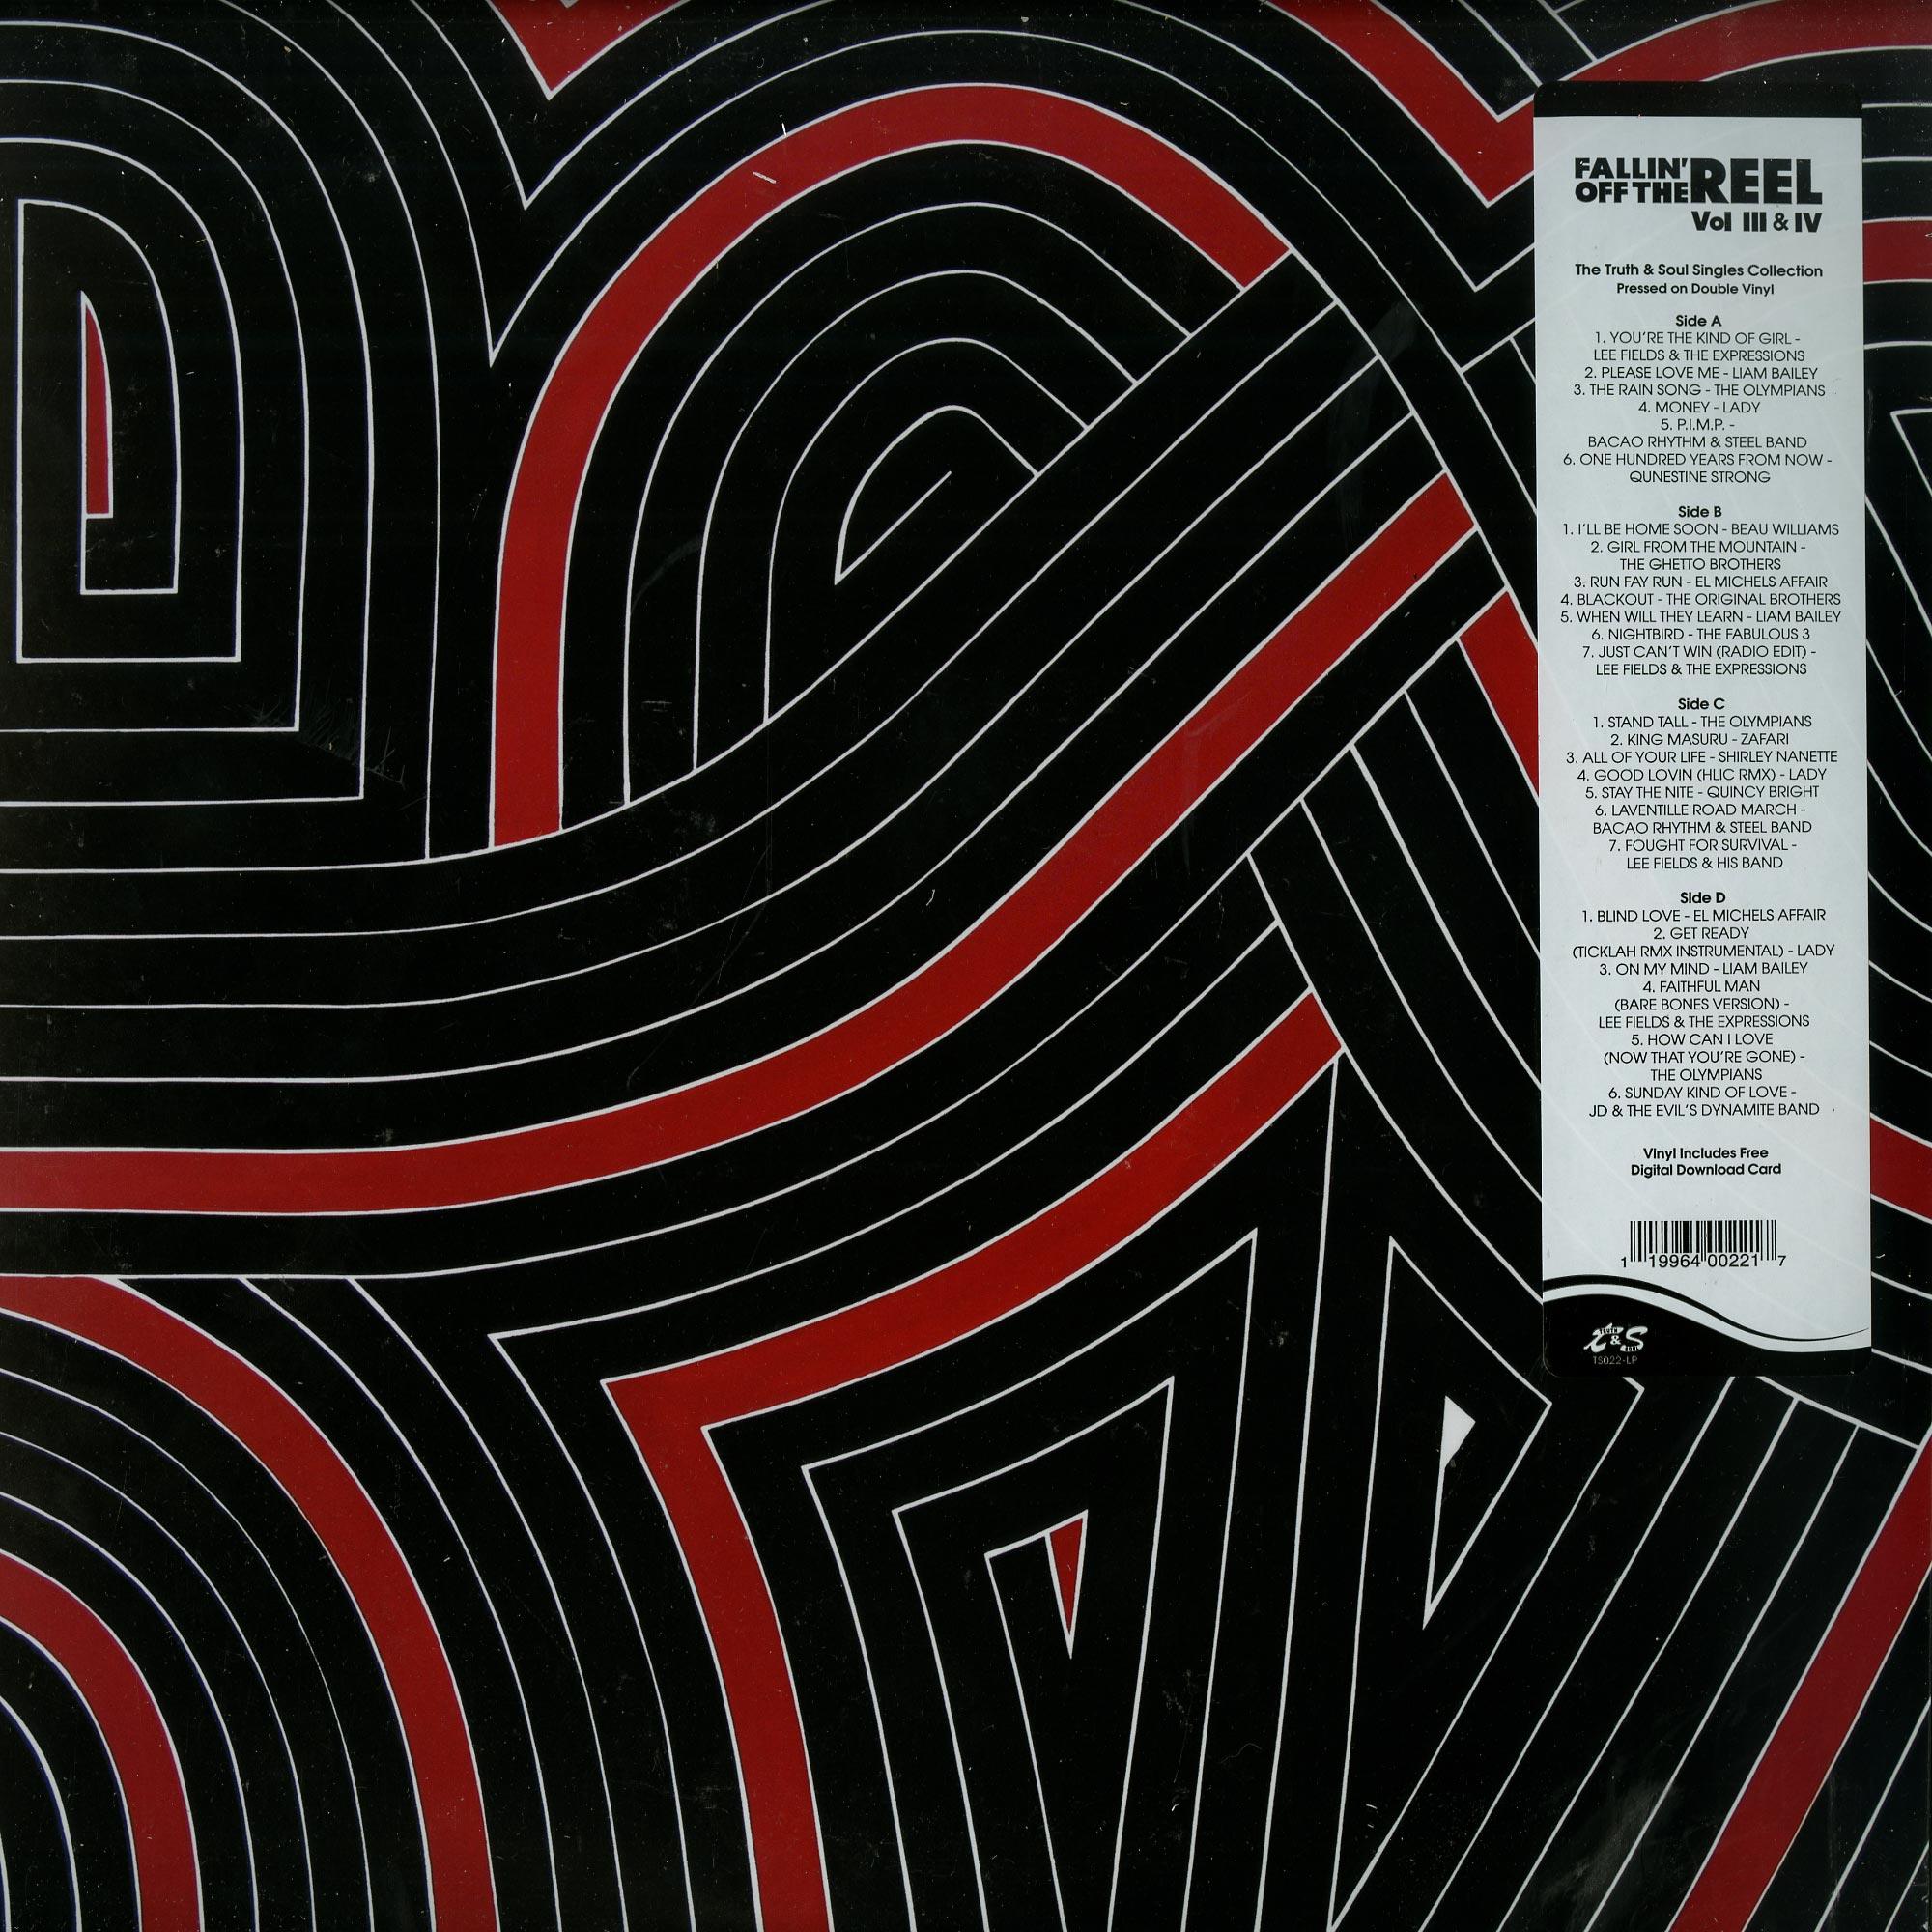 Various Artists - FALLIN OFF THE REEL VOL. III & IV